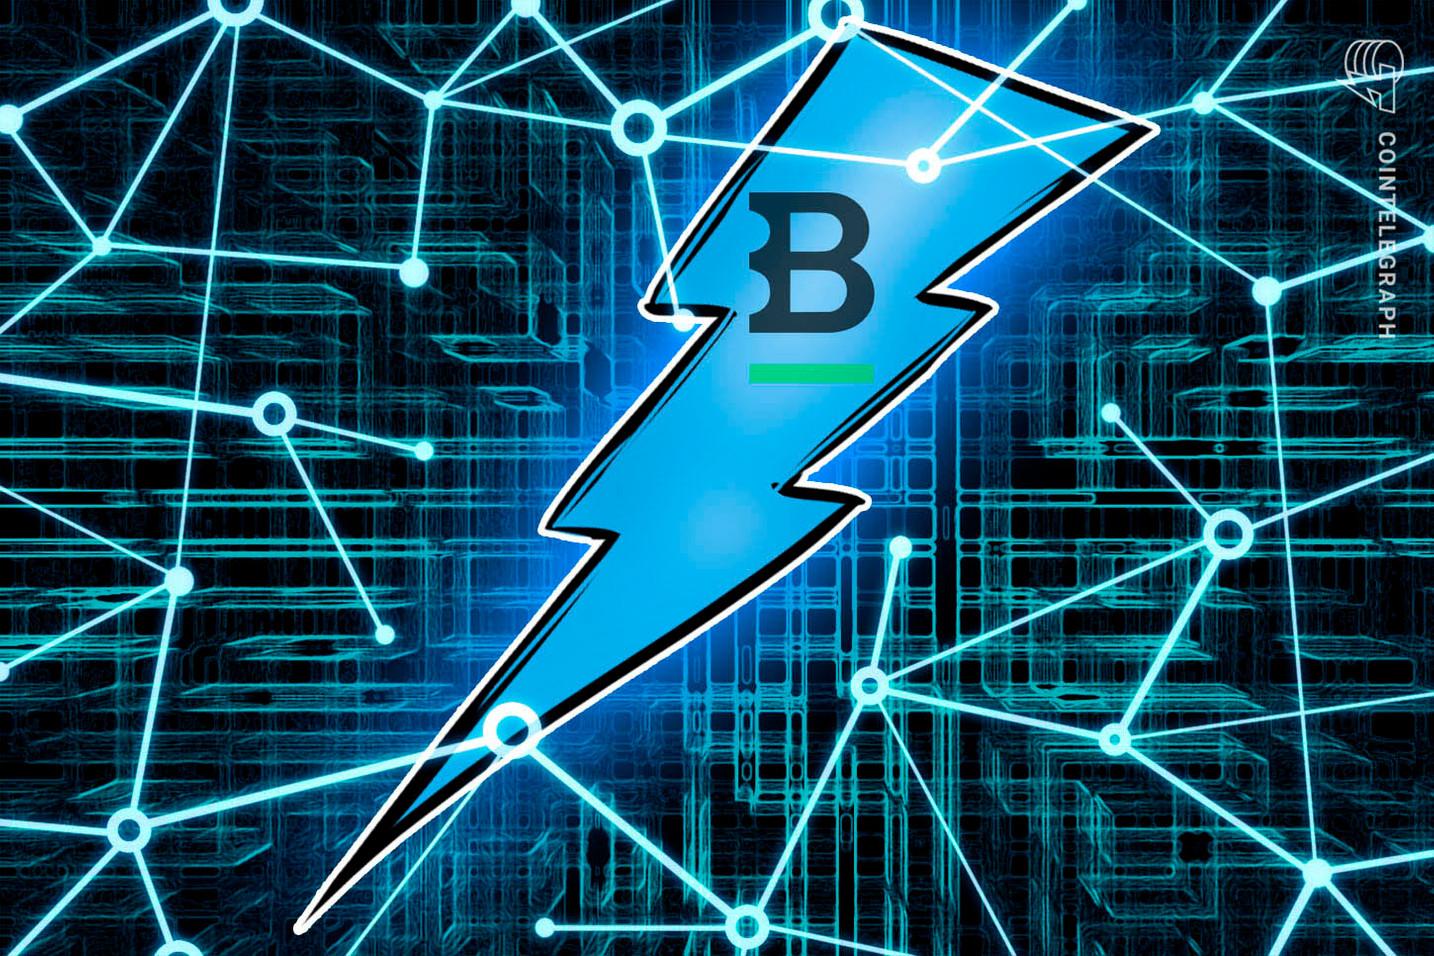 Kryptobörse Bitstamp richtet Lightning Network-Knoten